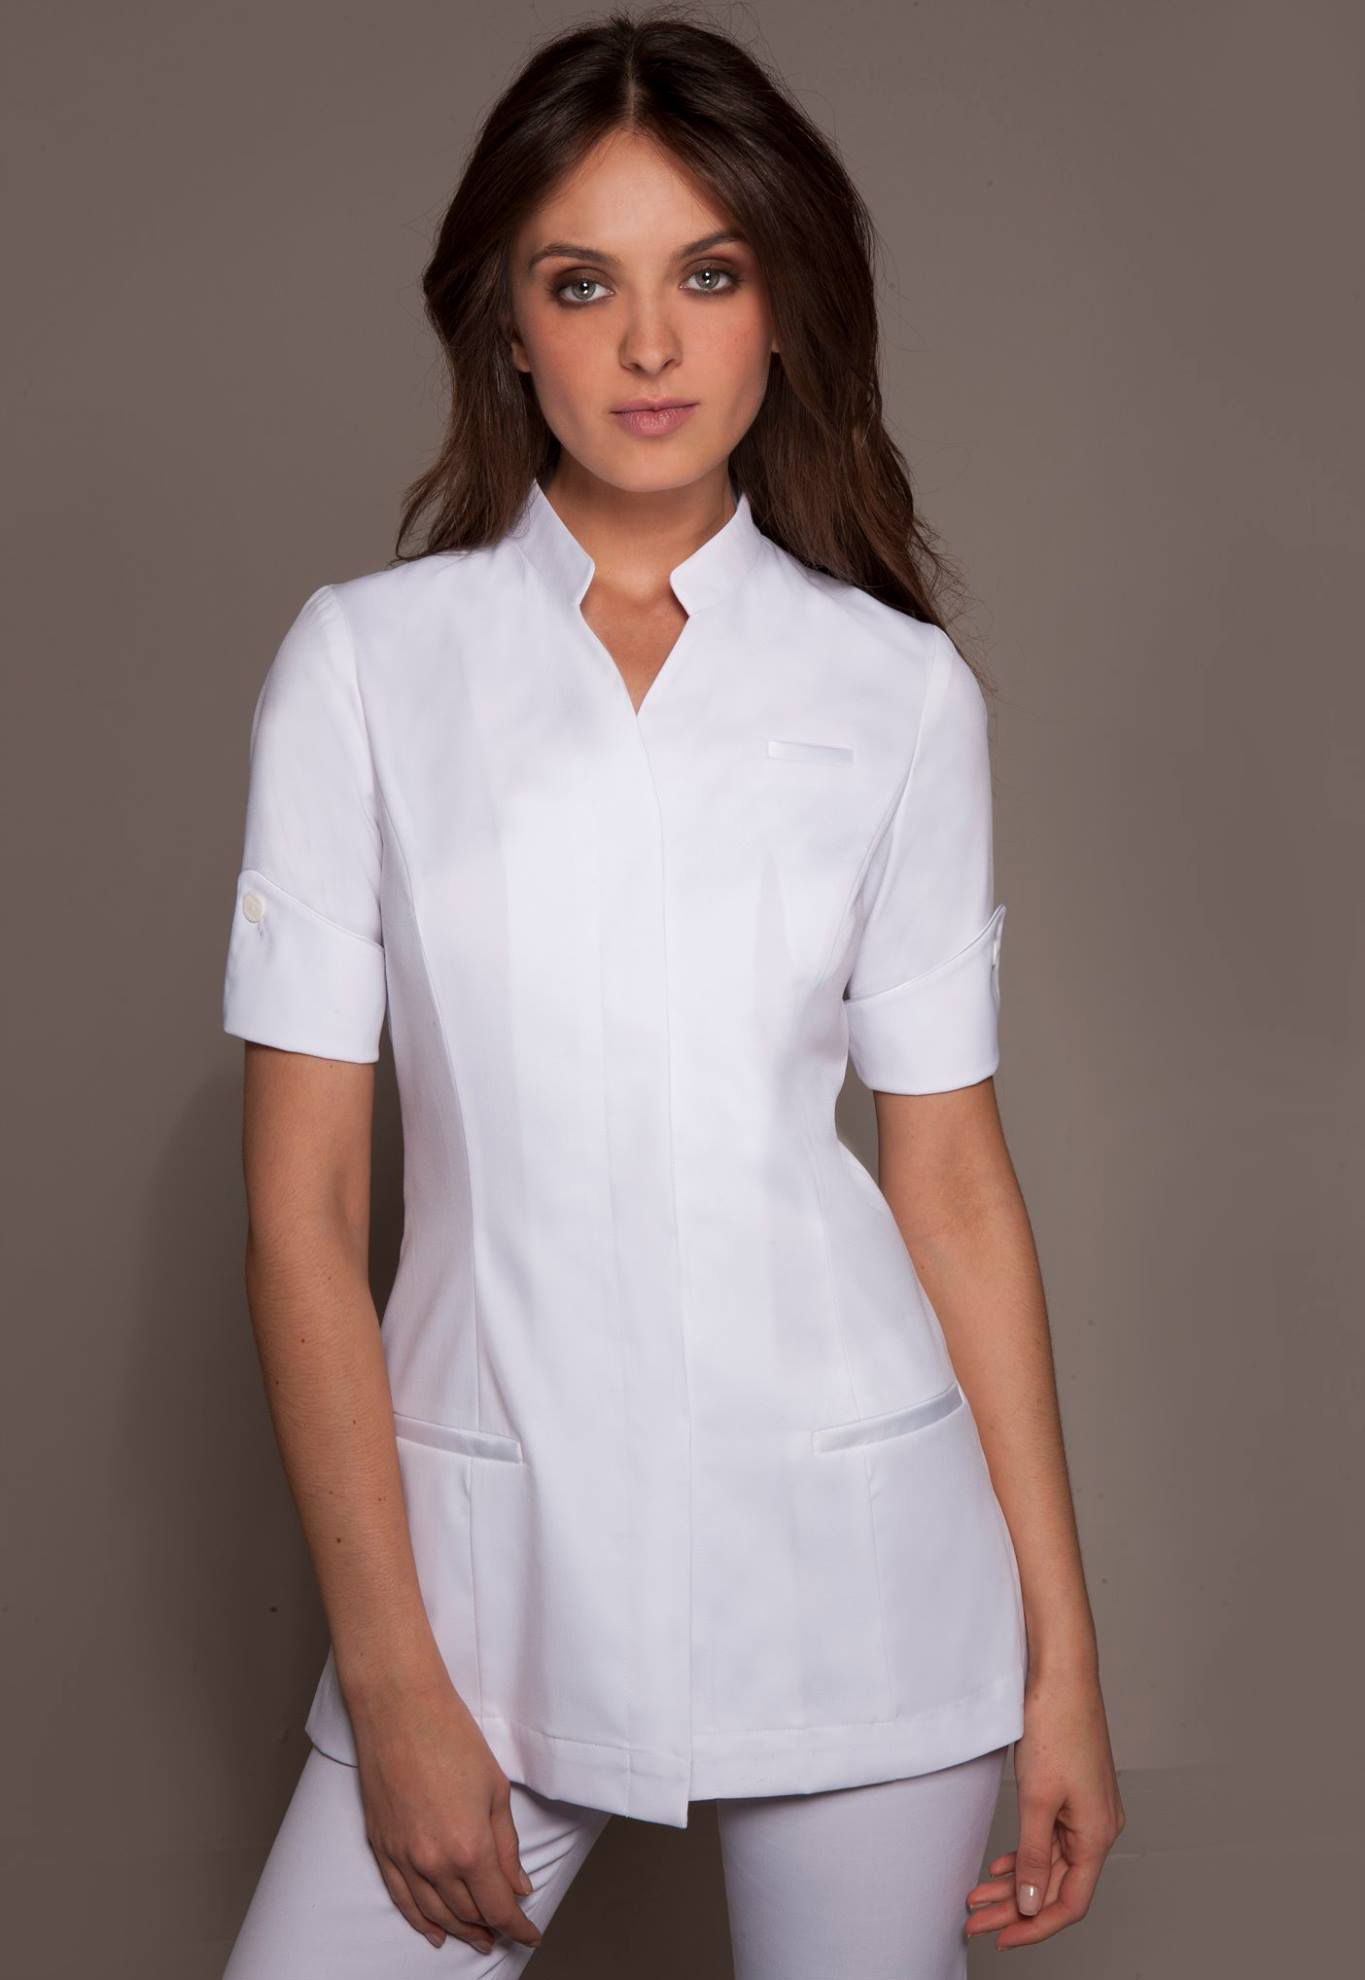 Stylemonarchy spa uniforms niagara tunic aesthetic for Spa uniform tunic